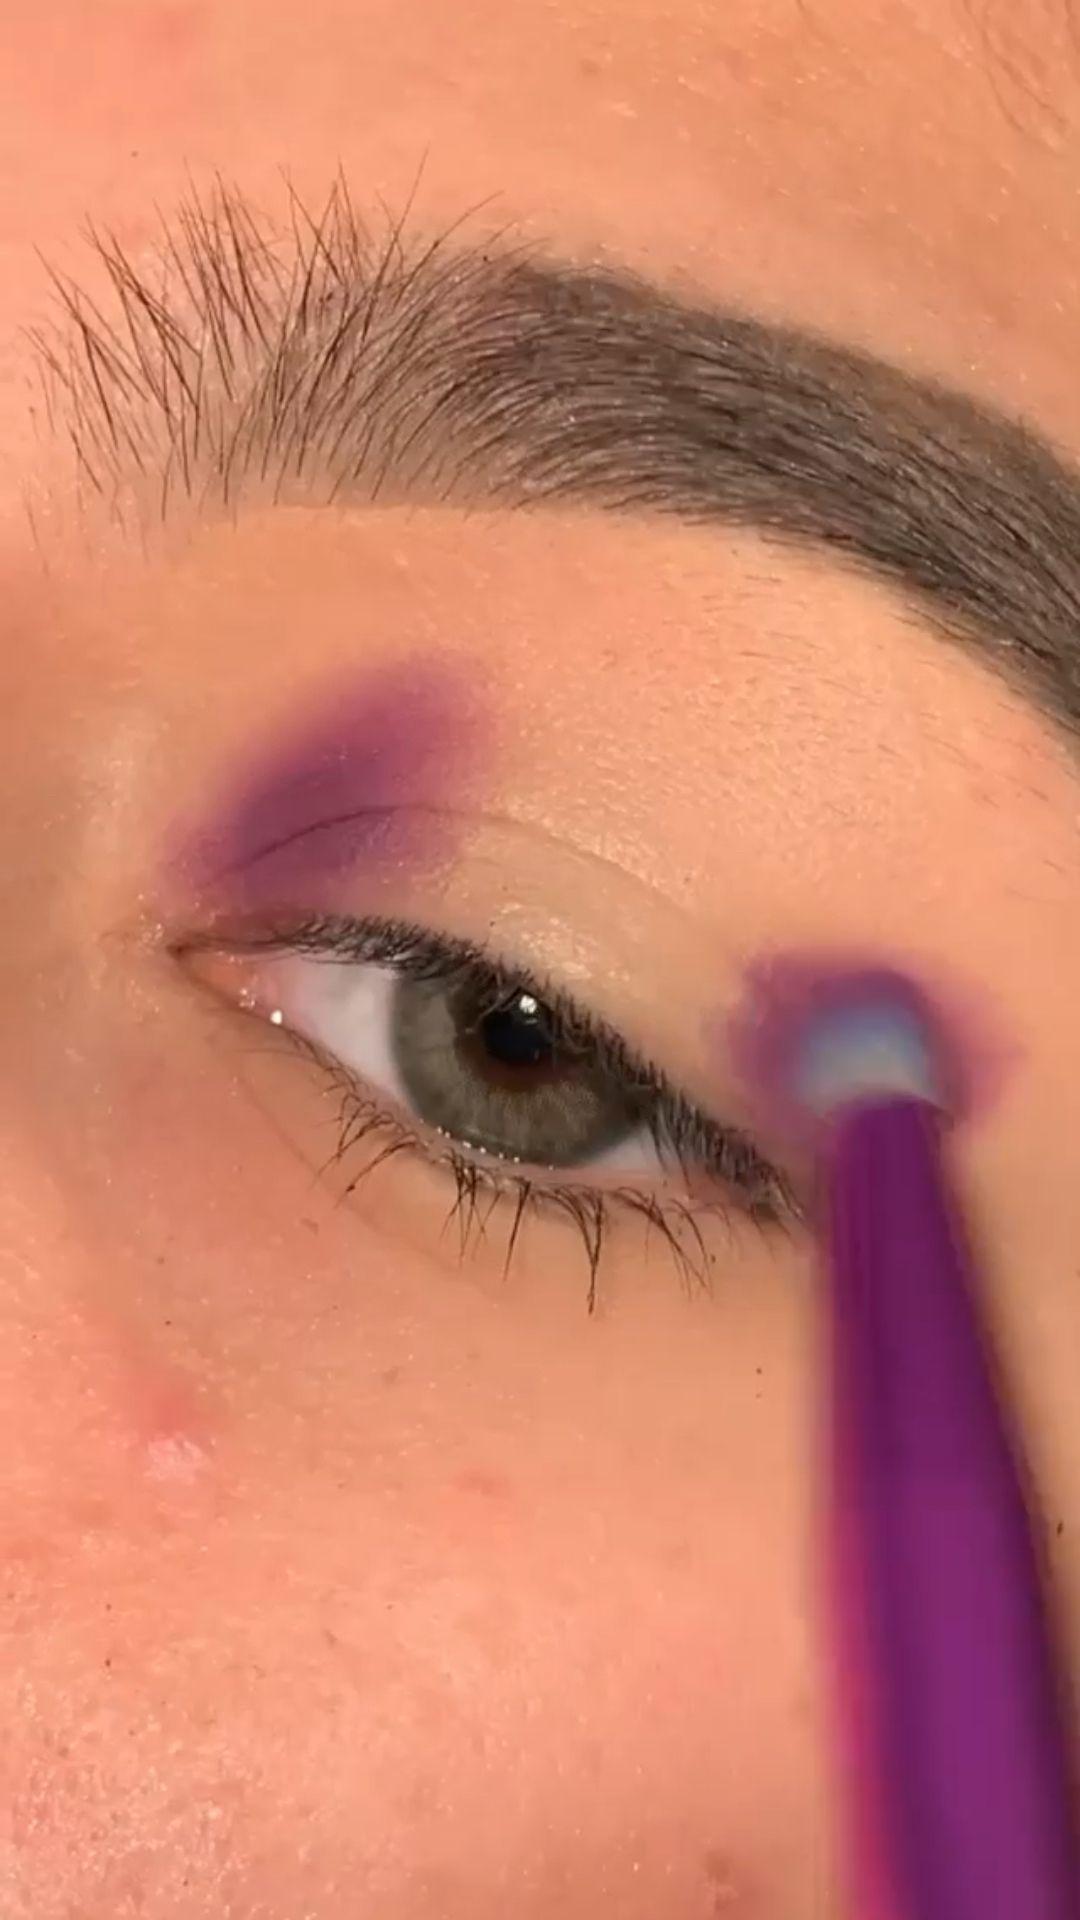 Magnetic lashes anyone?